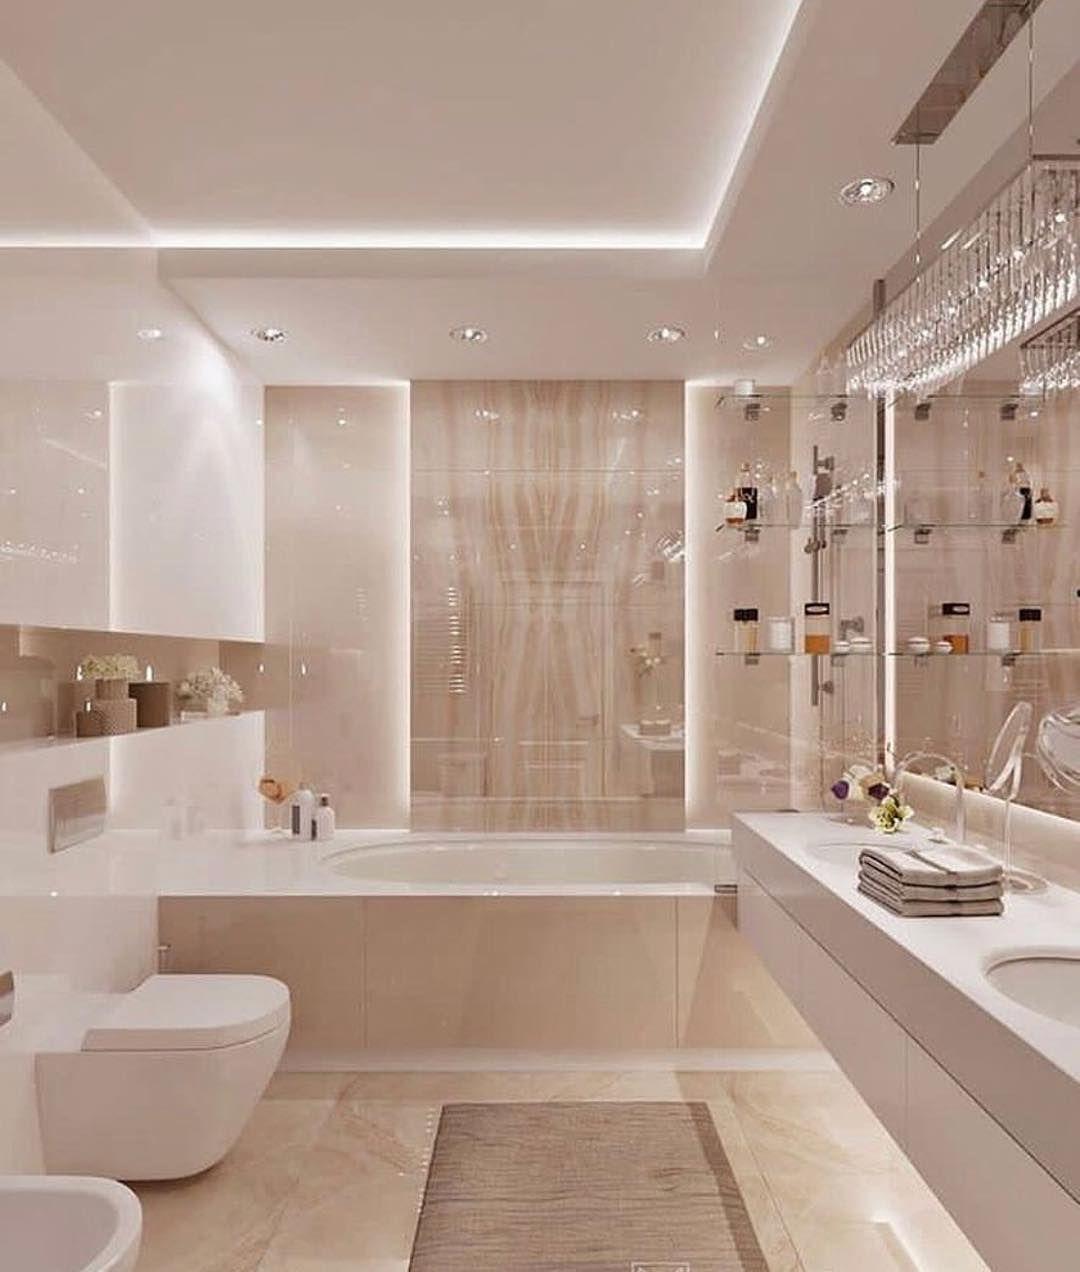 Luxury Interiors On Instagram 1 2 Or 3 Follow Onlyforluxury